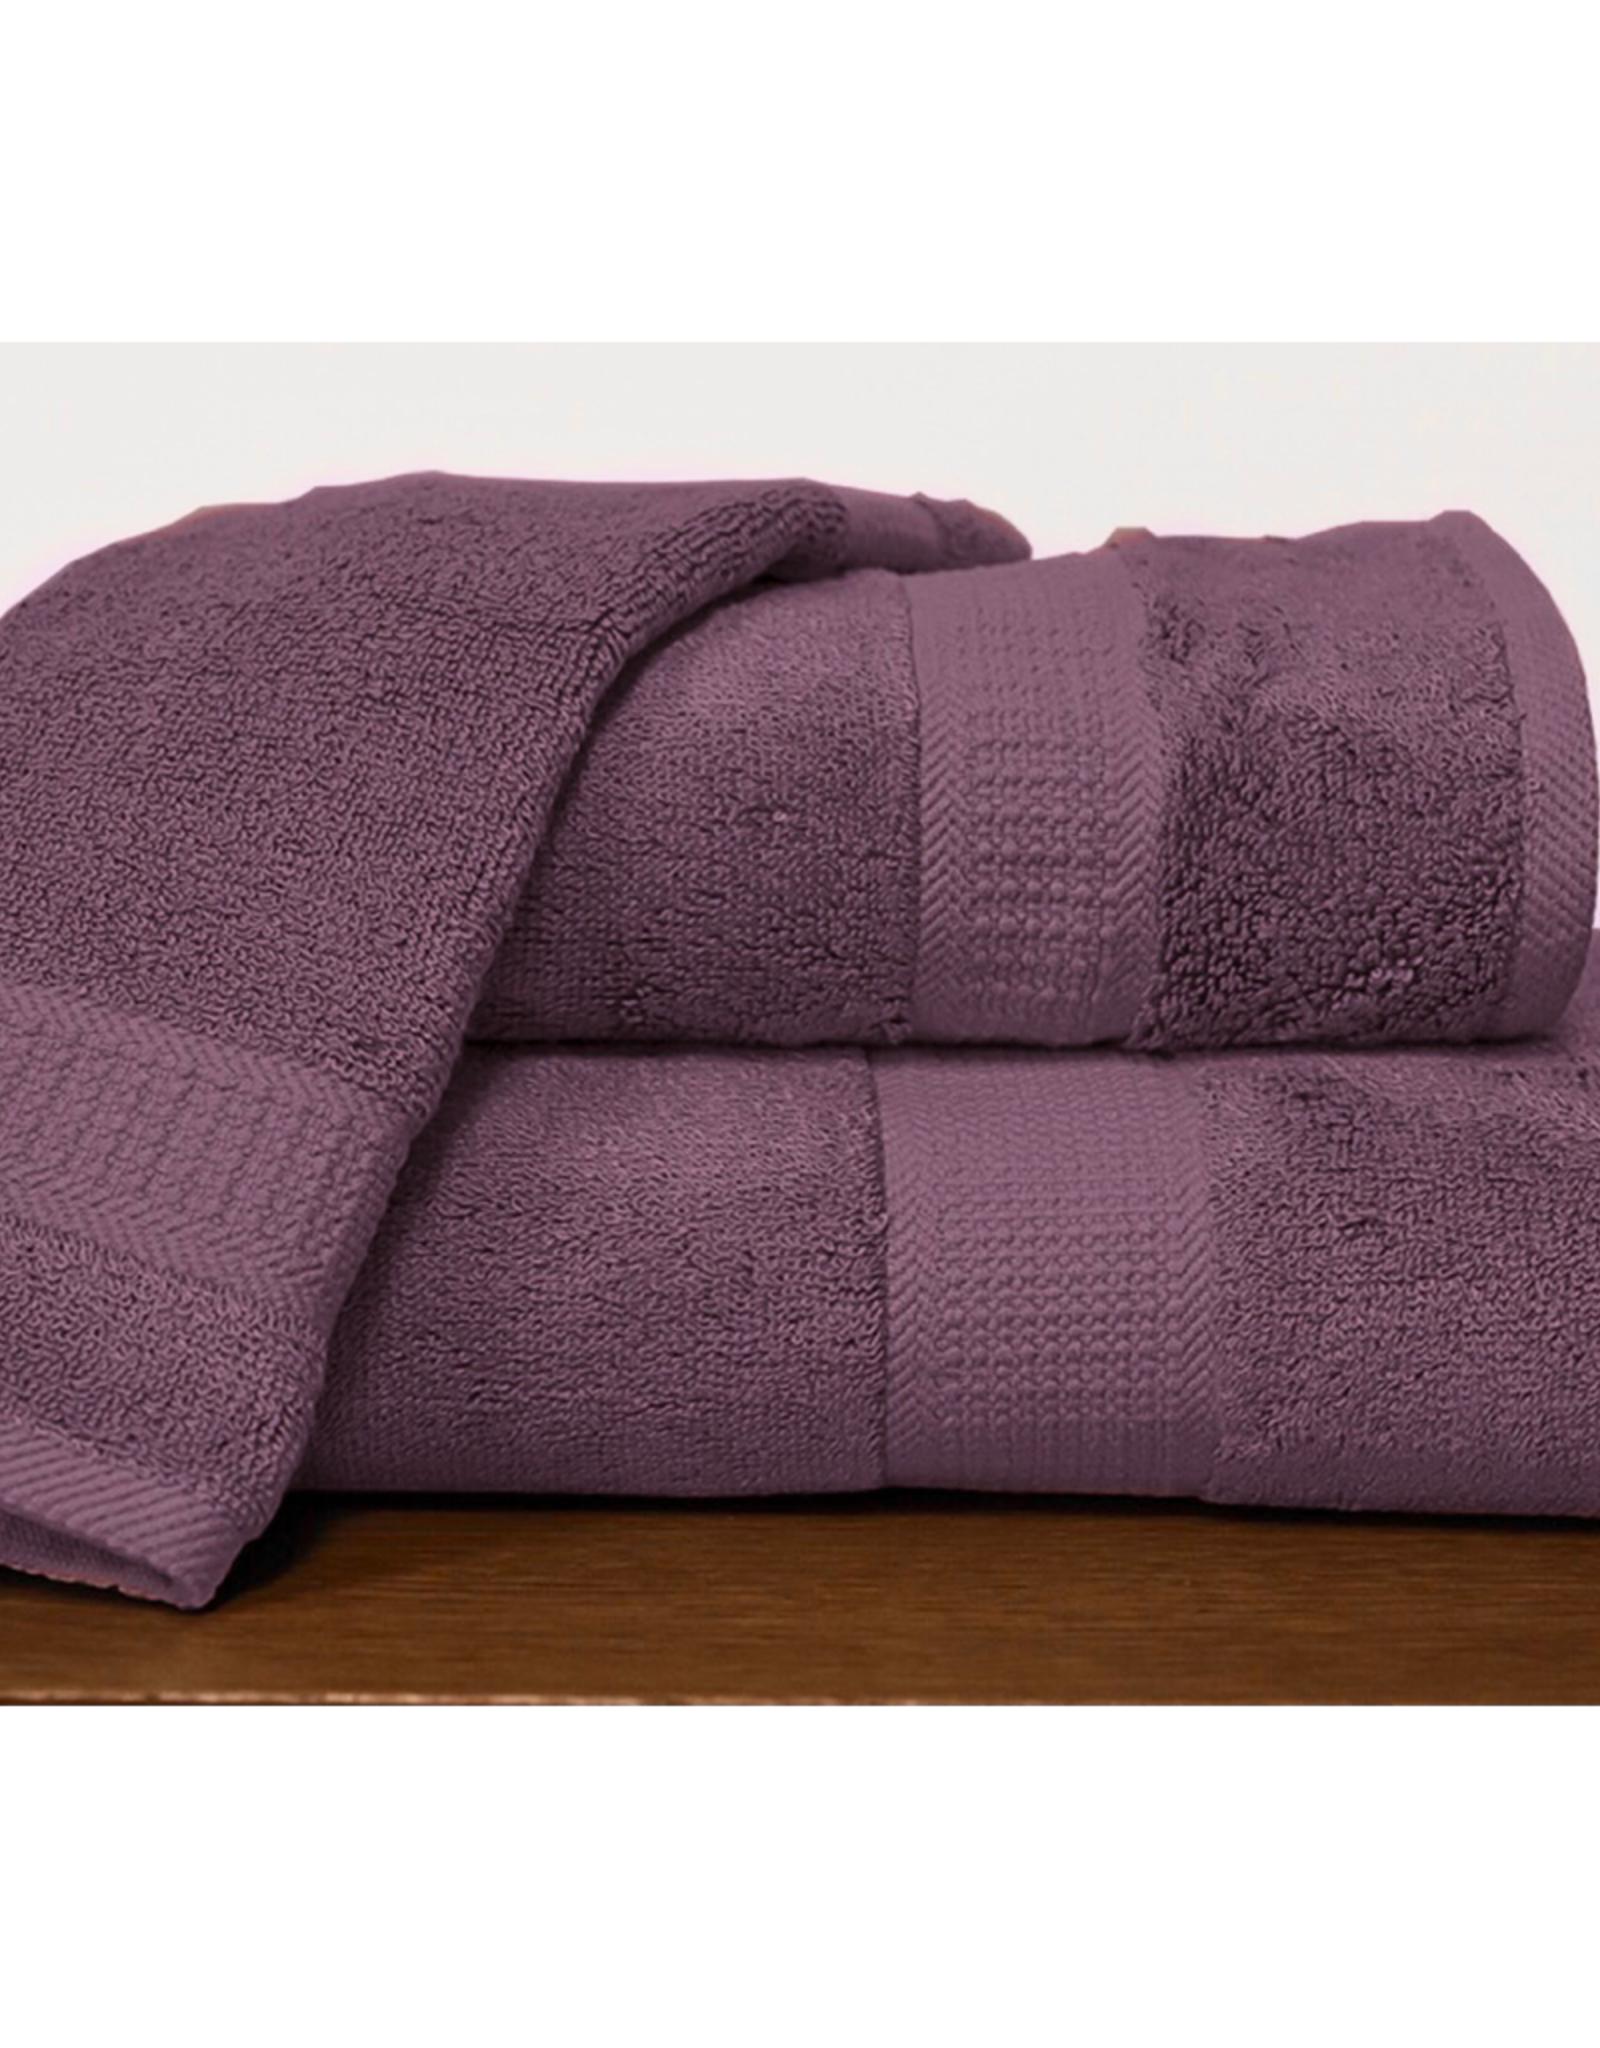 Alamode Home Bath Towel RJS Bamboo Lavender